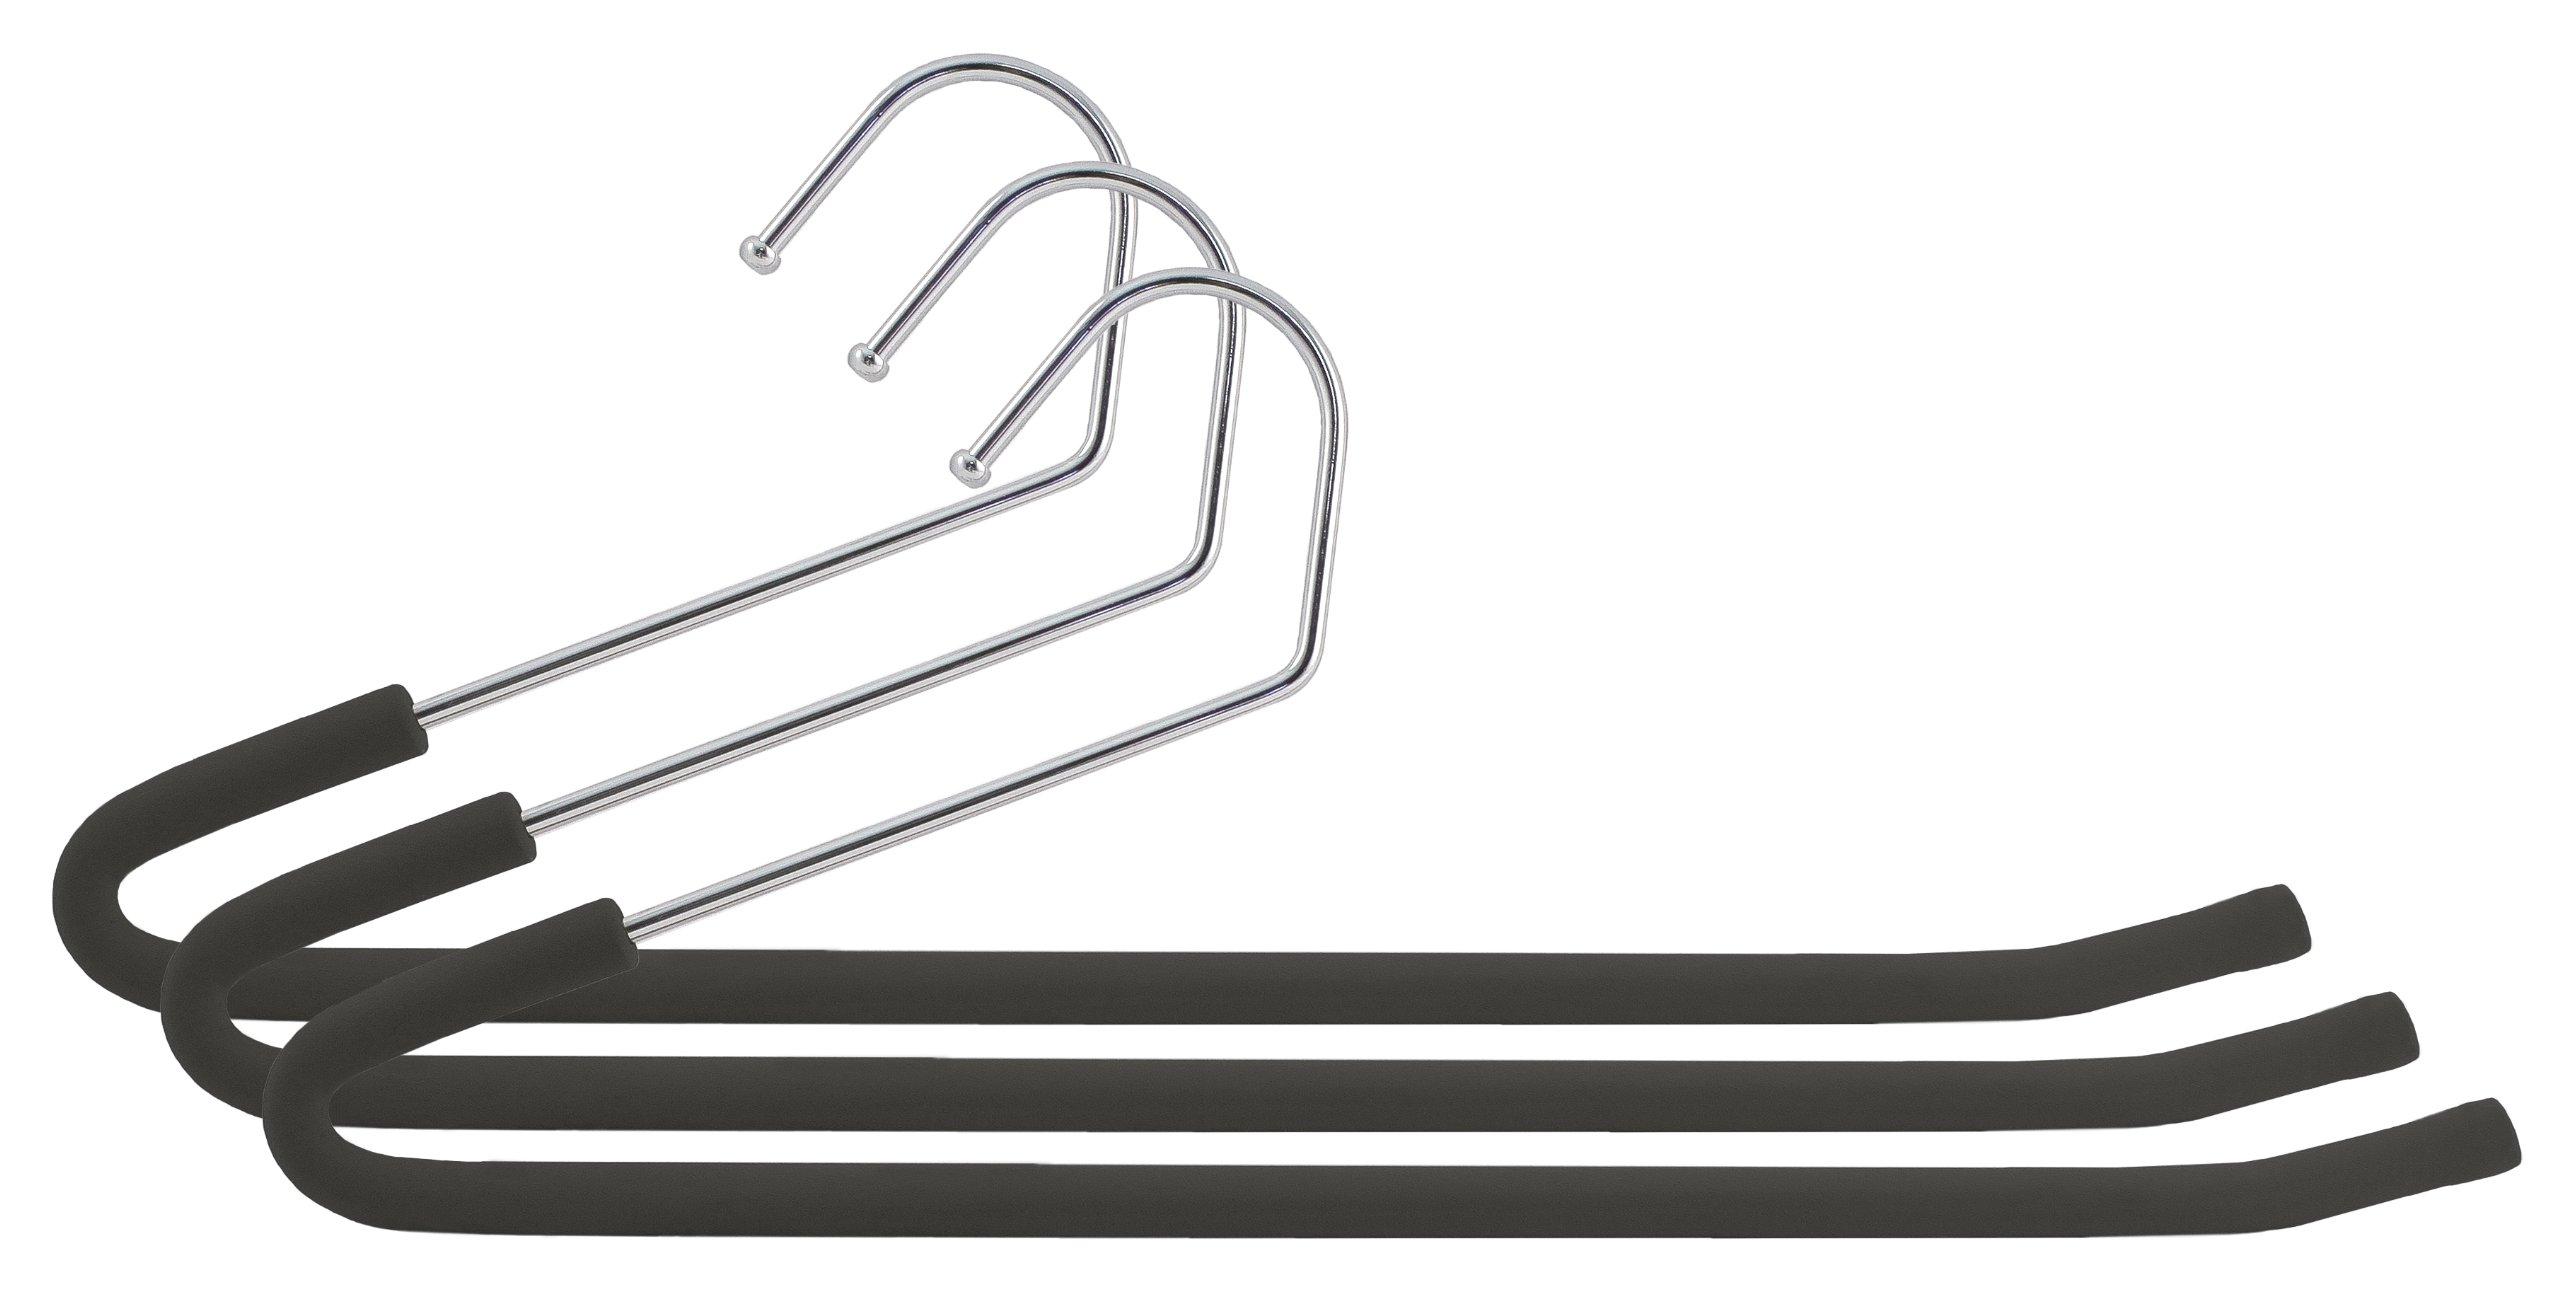 Closet Complete Foam-Coated Chrome Non-Slip Pants Hangers, Black, Set of 3 product image